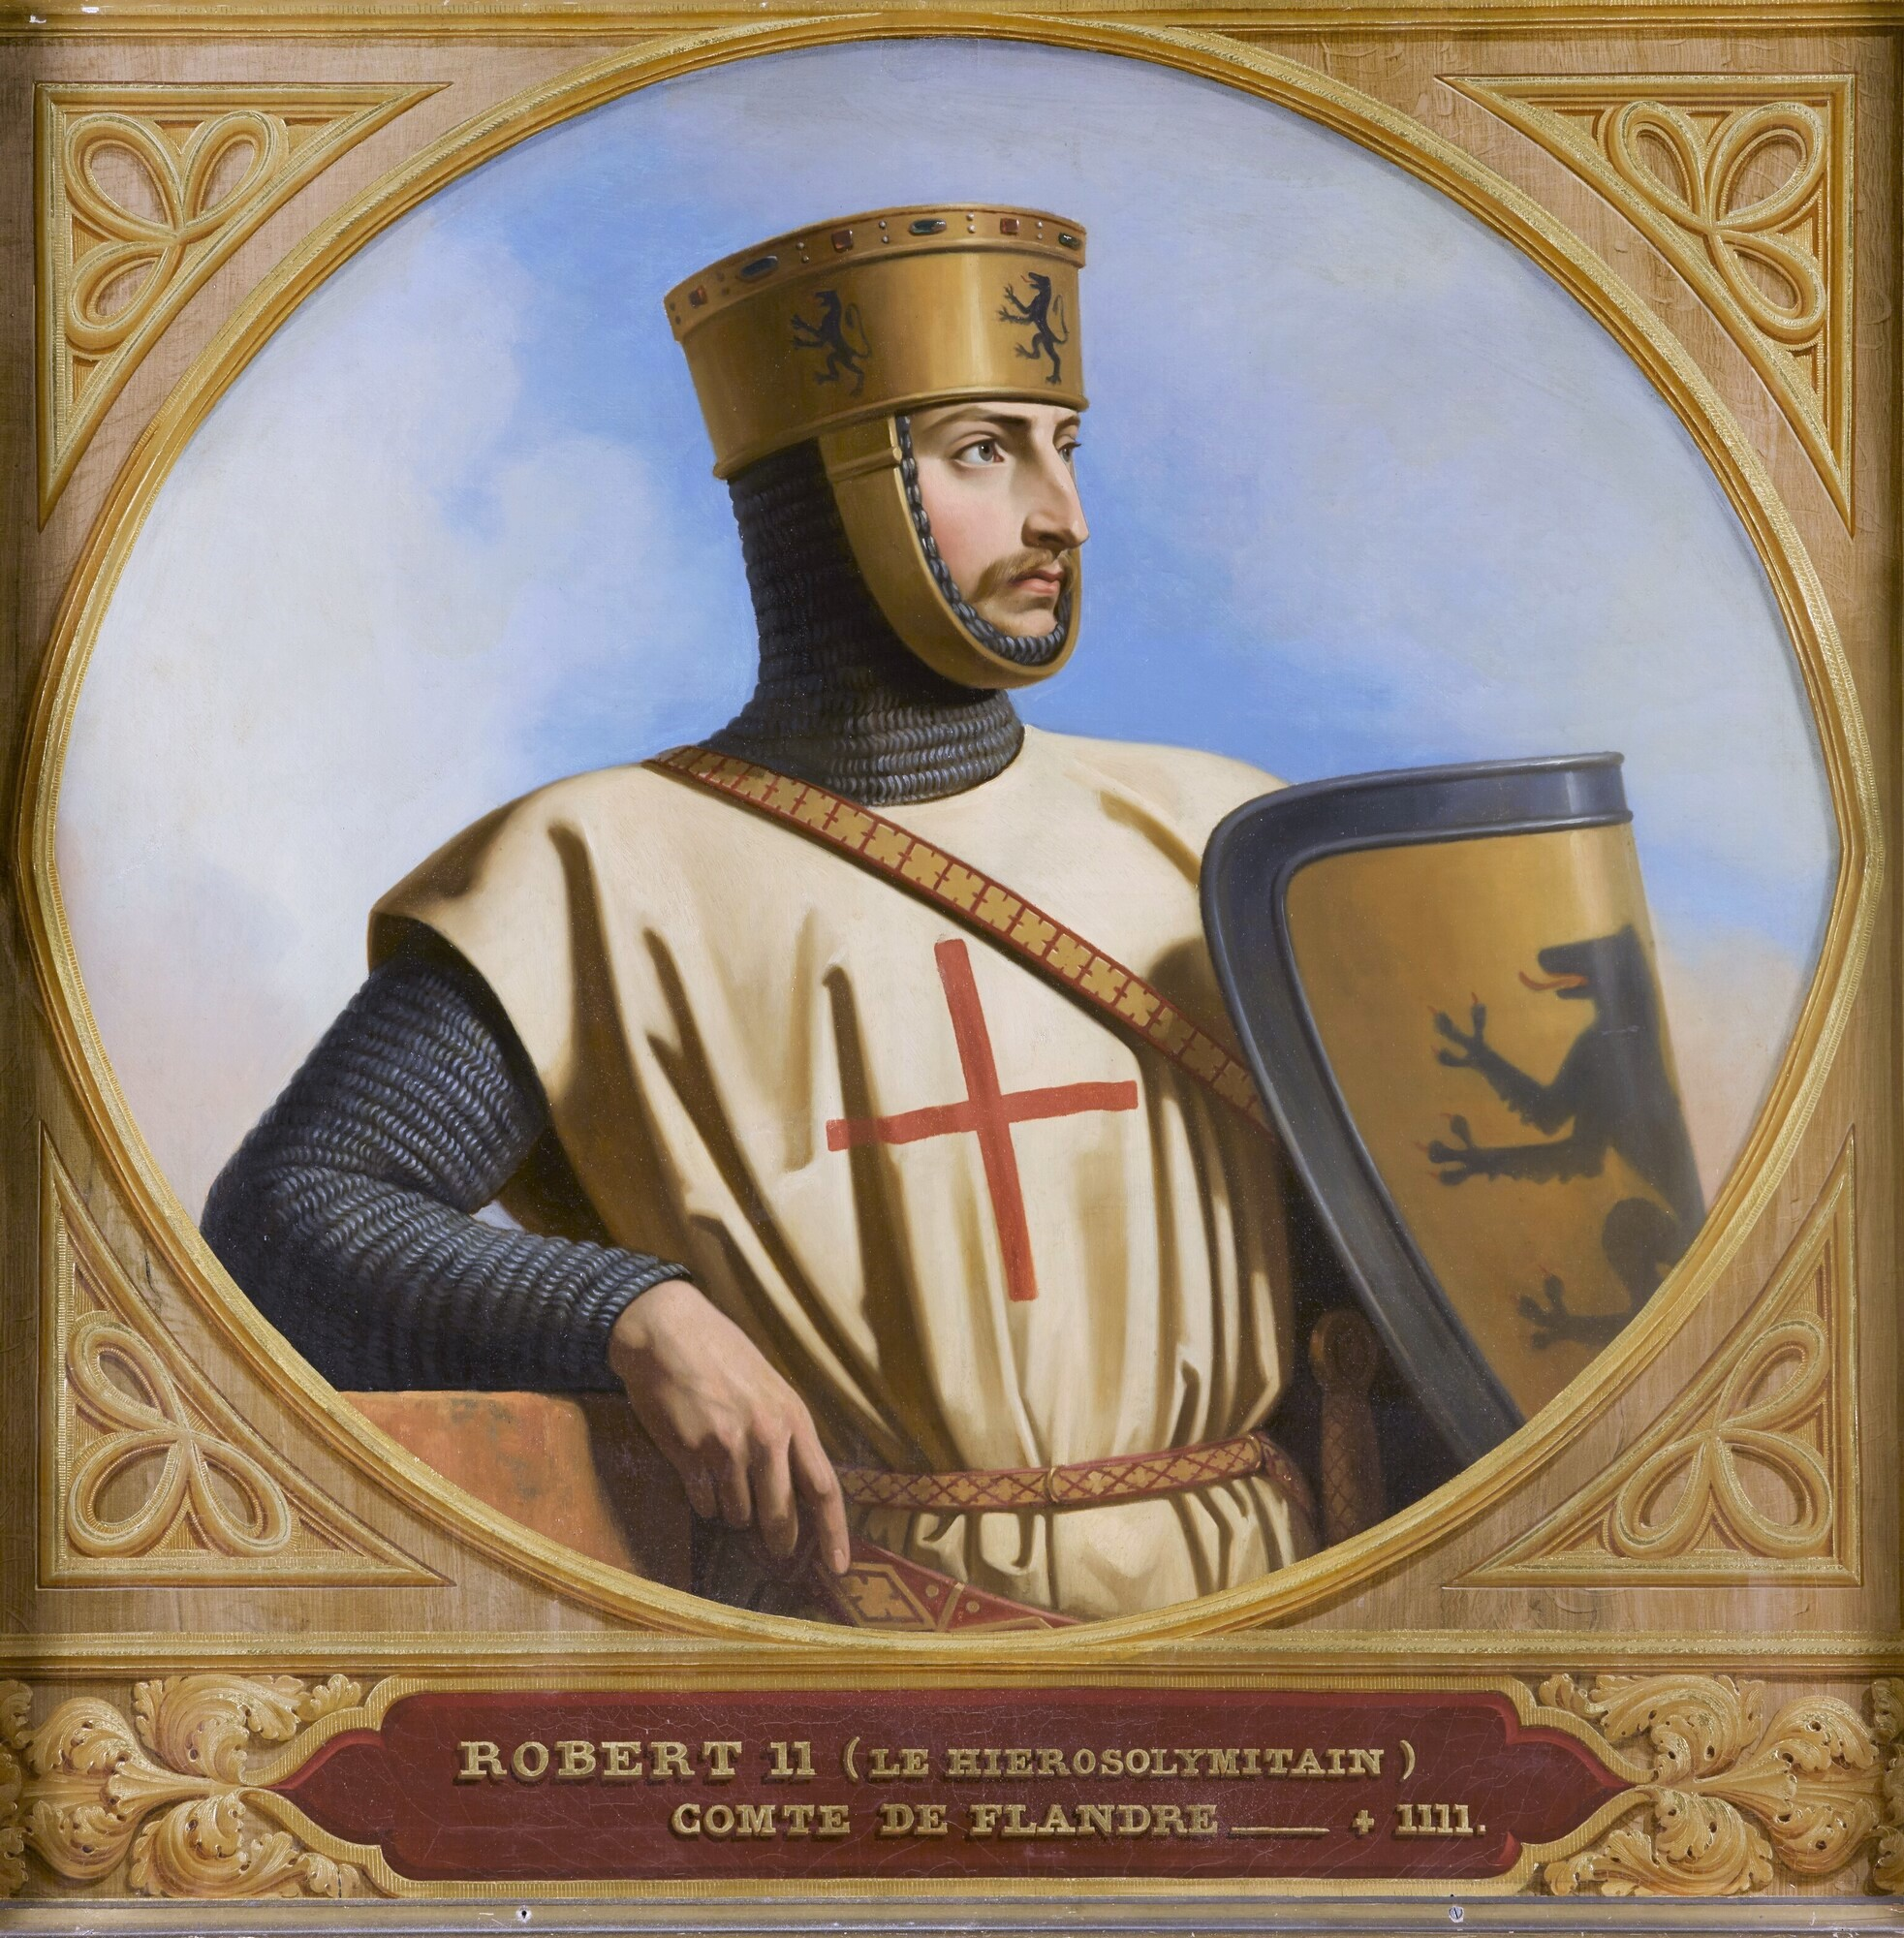 Robert II, dit le Iérosolymitain, comte de Flandre (?-1111).